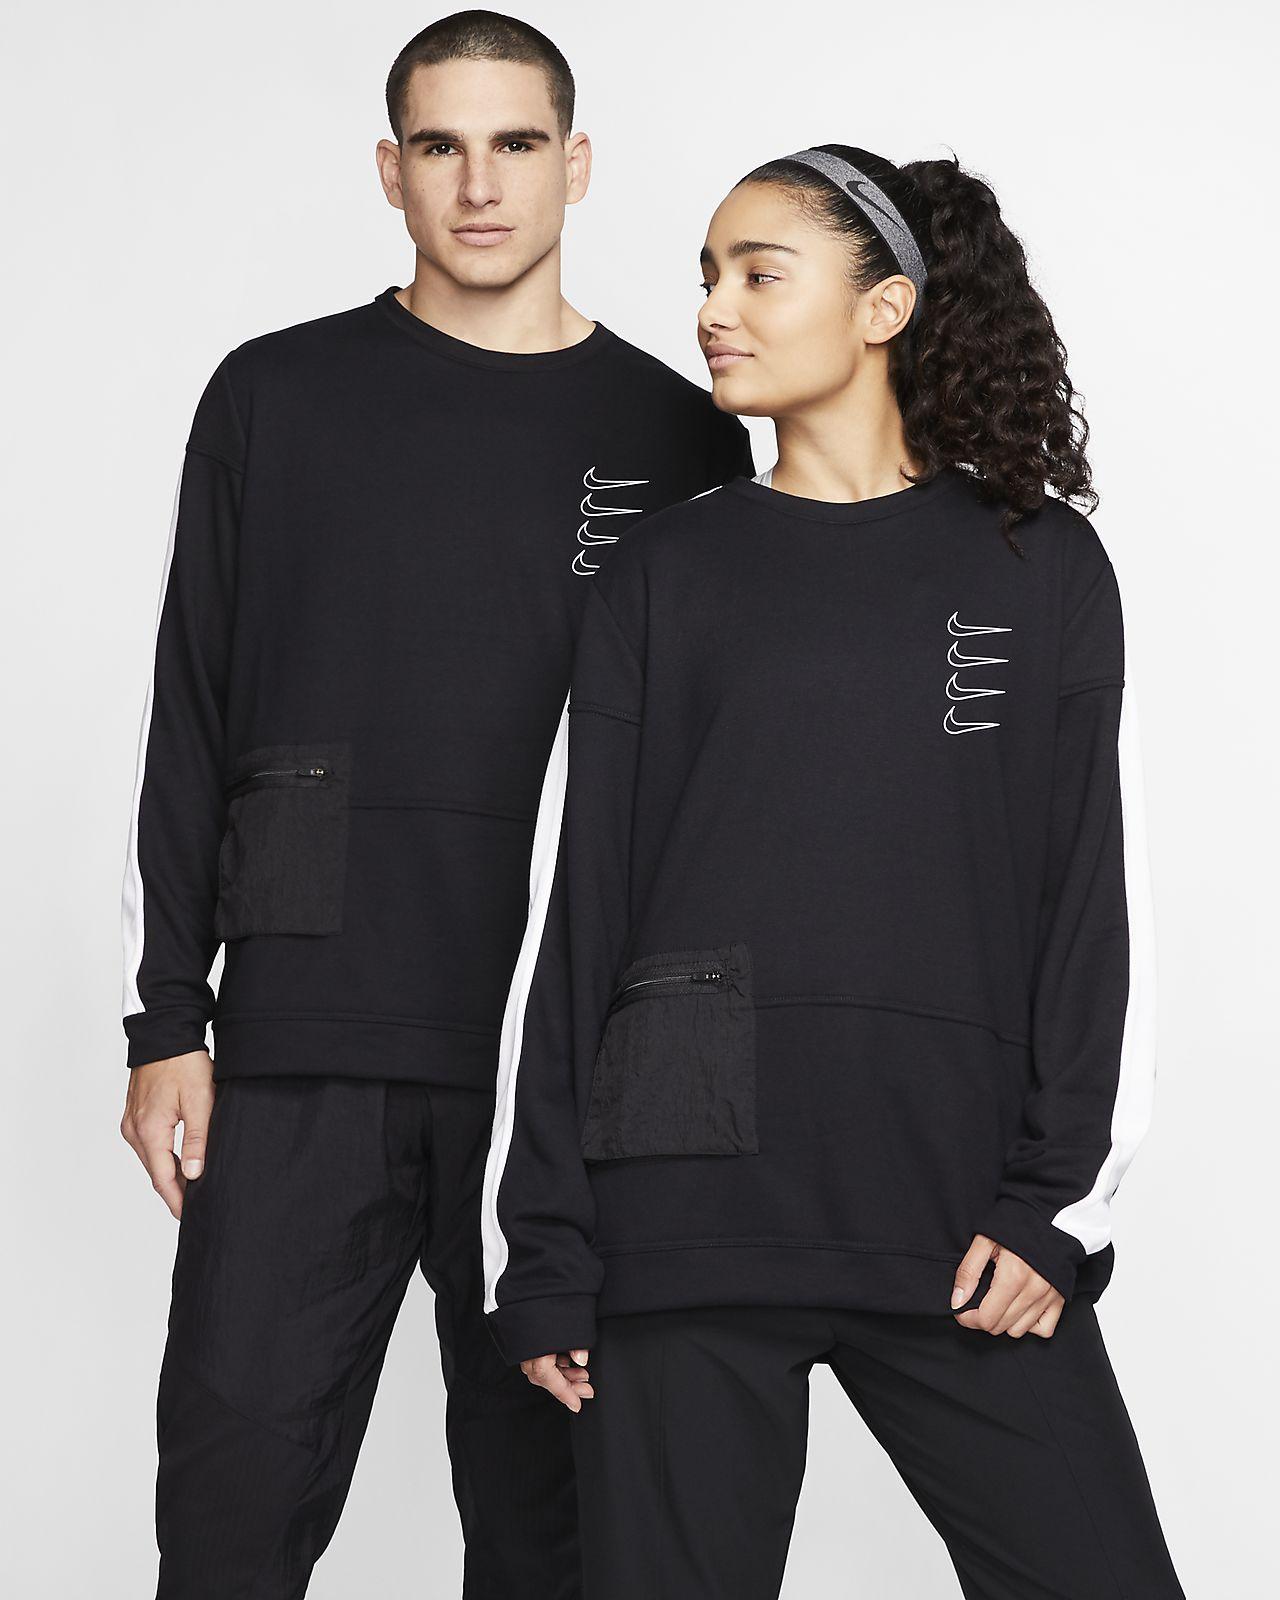 Nike Dri-FIT Fleece-Trainingsoberteil für Herren